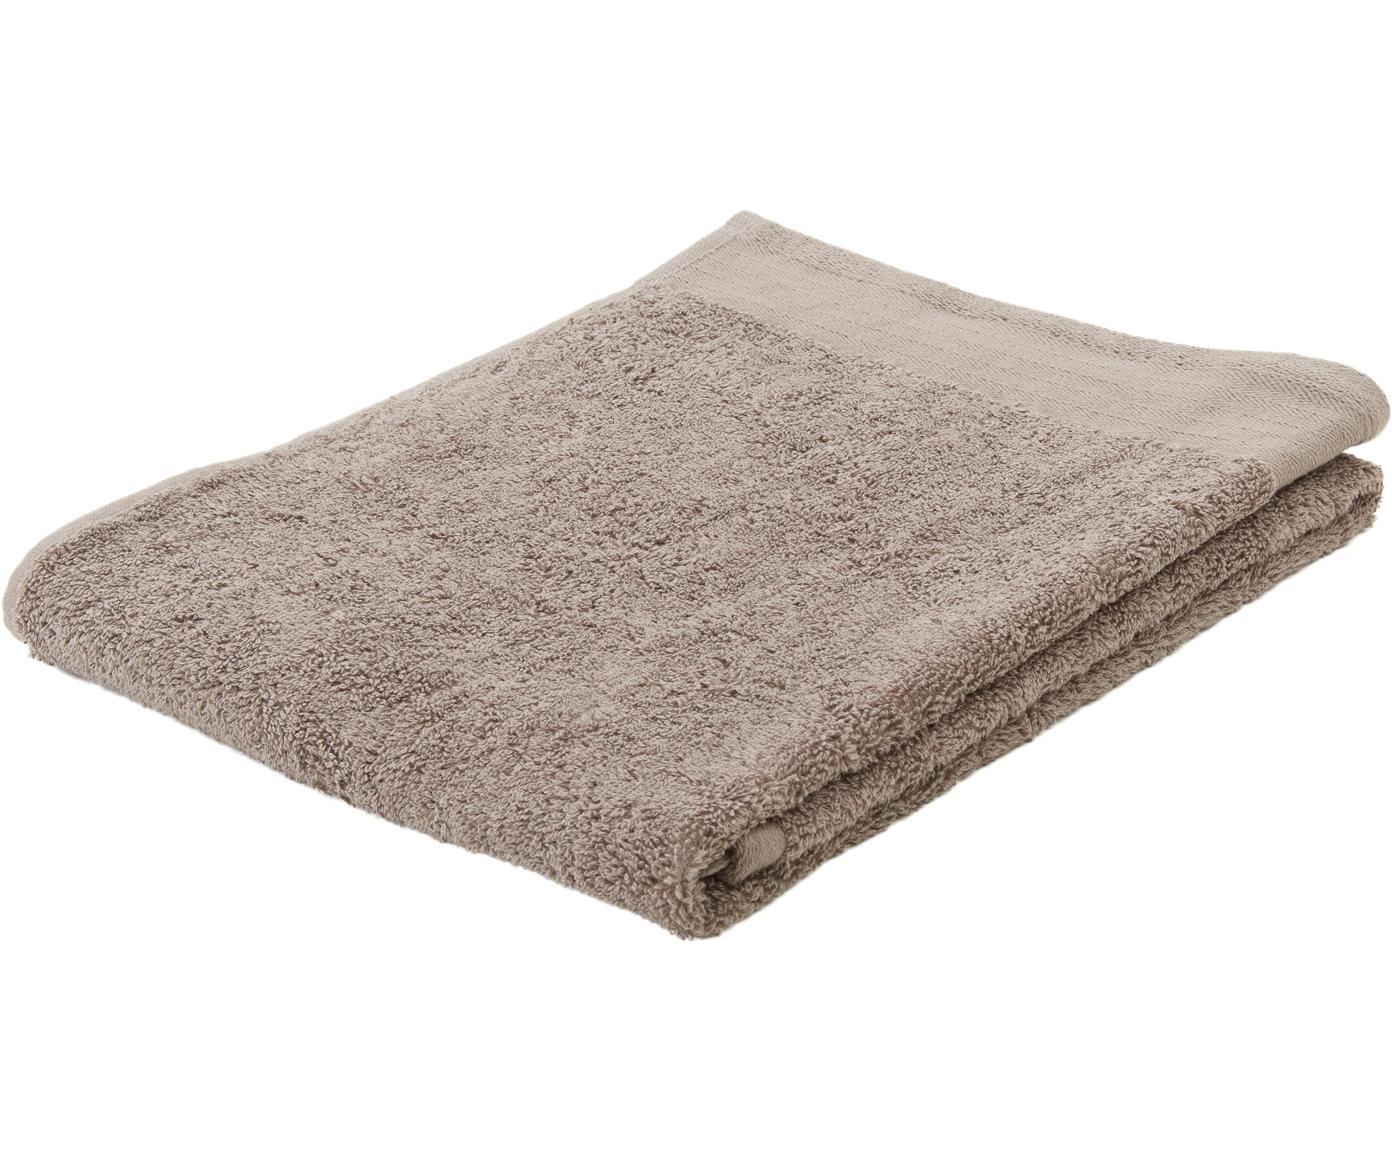 Asciugamano Soft Cotton, Taupe, Asciugamano